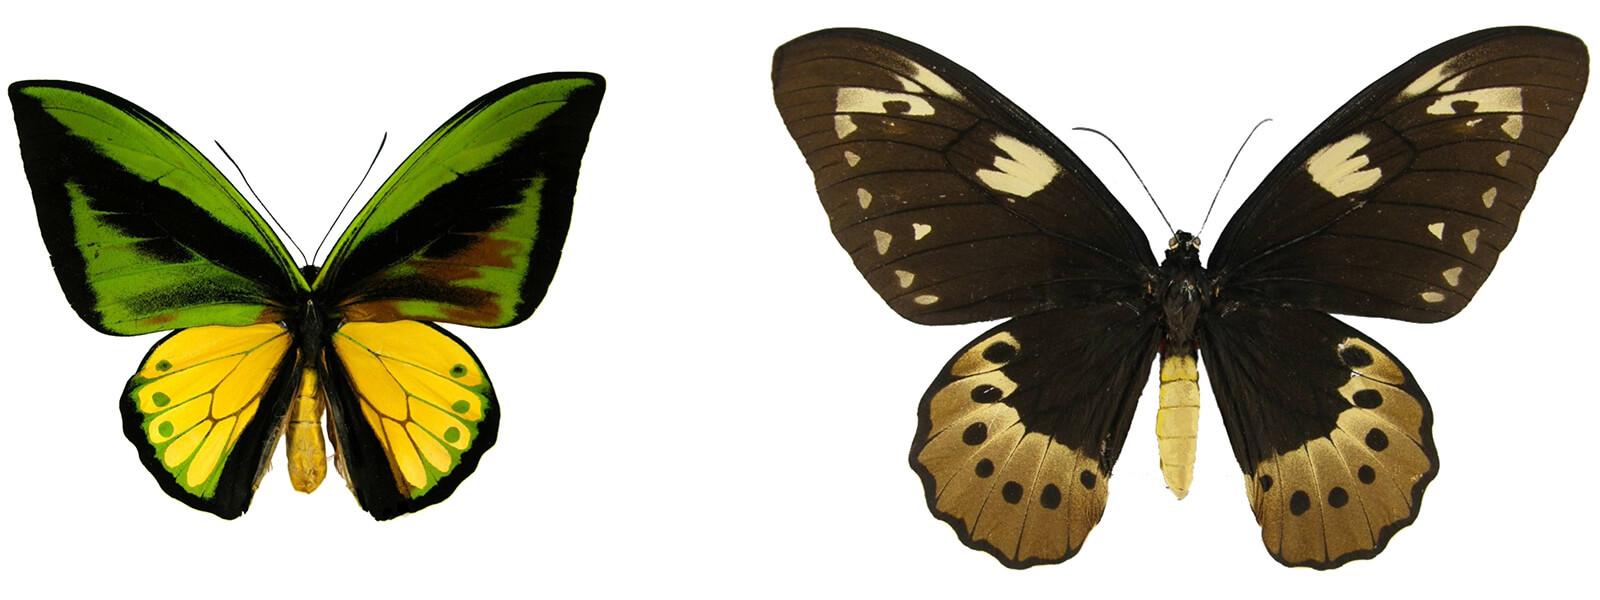 Ornithoptera goliath